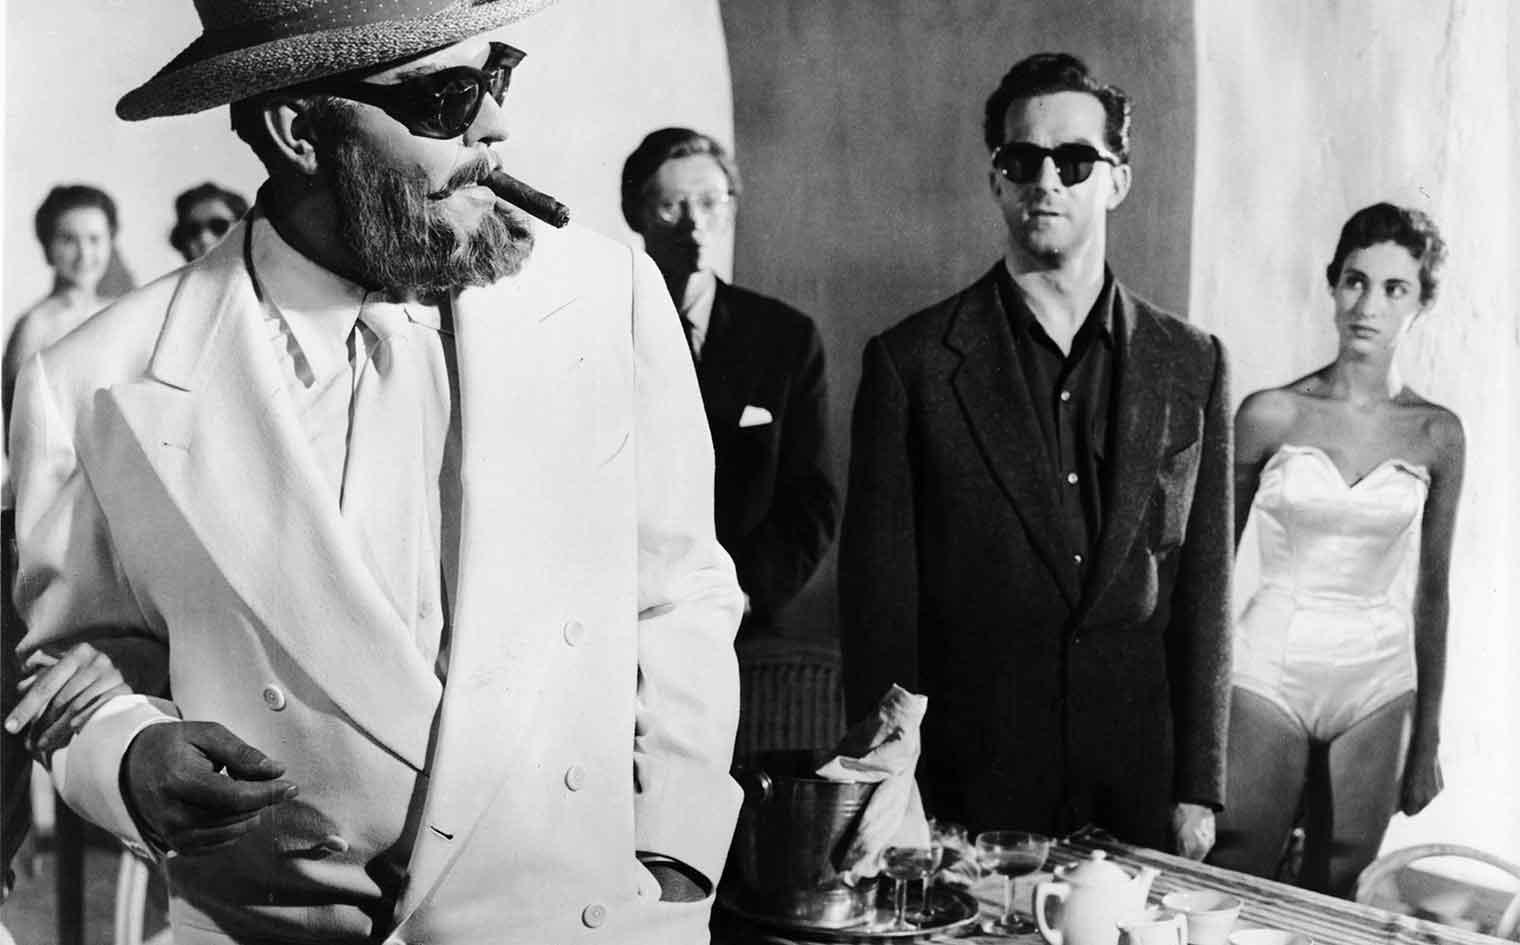 Mr. Arkadin (1955) Directed by : Orson Welles Shown : Orson Welles (as Gregory Arkadin), Robert Arden (as Guy Van Stratten)